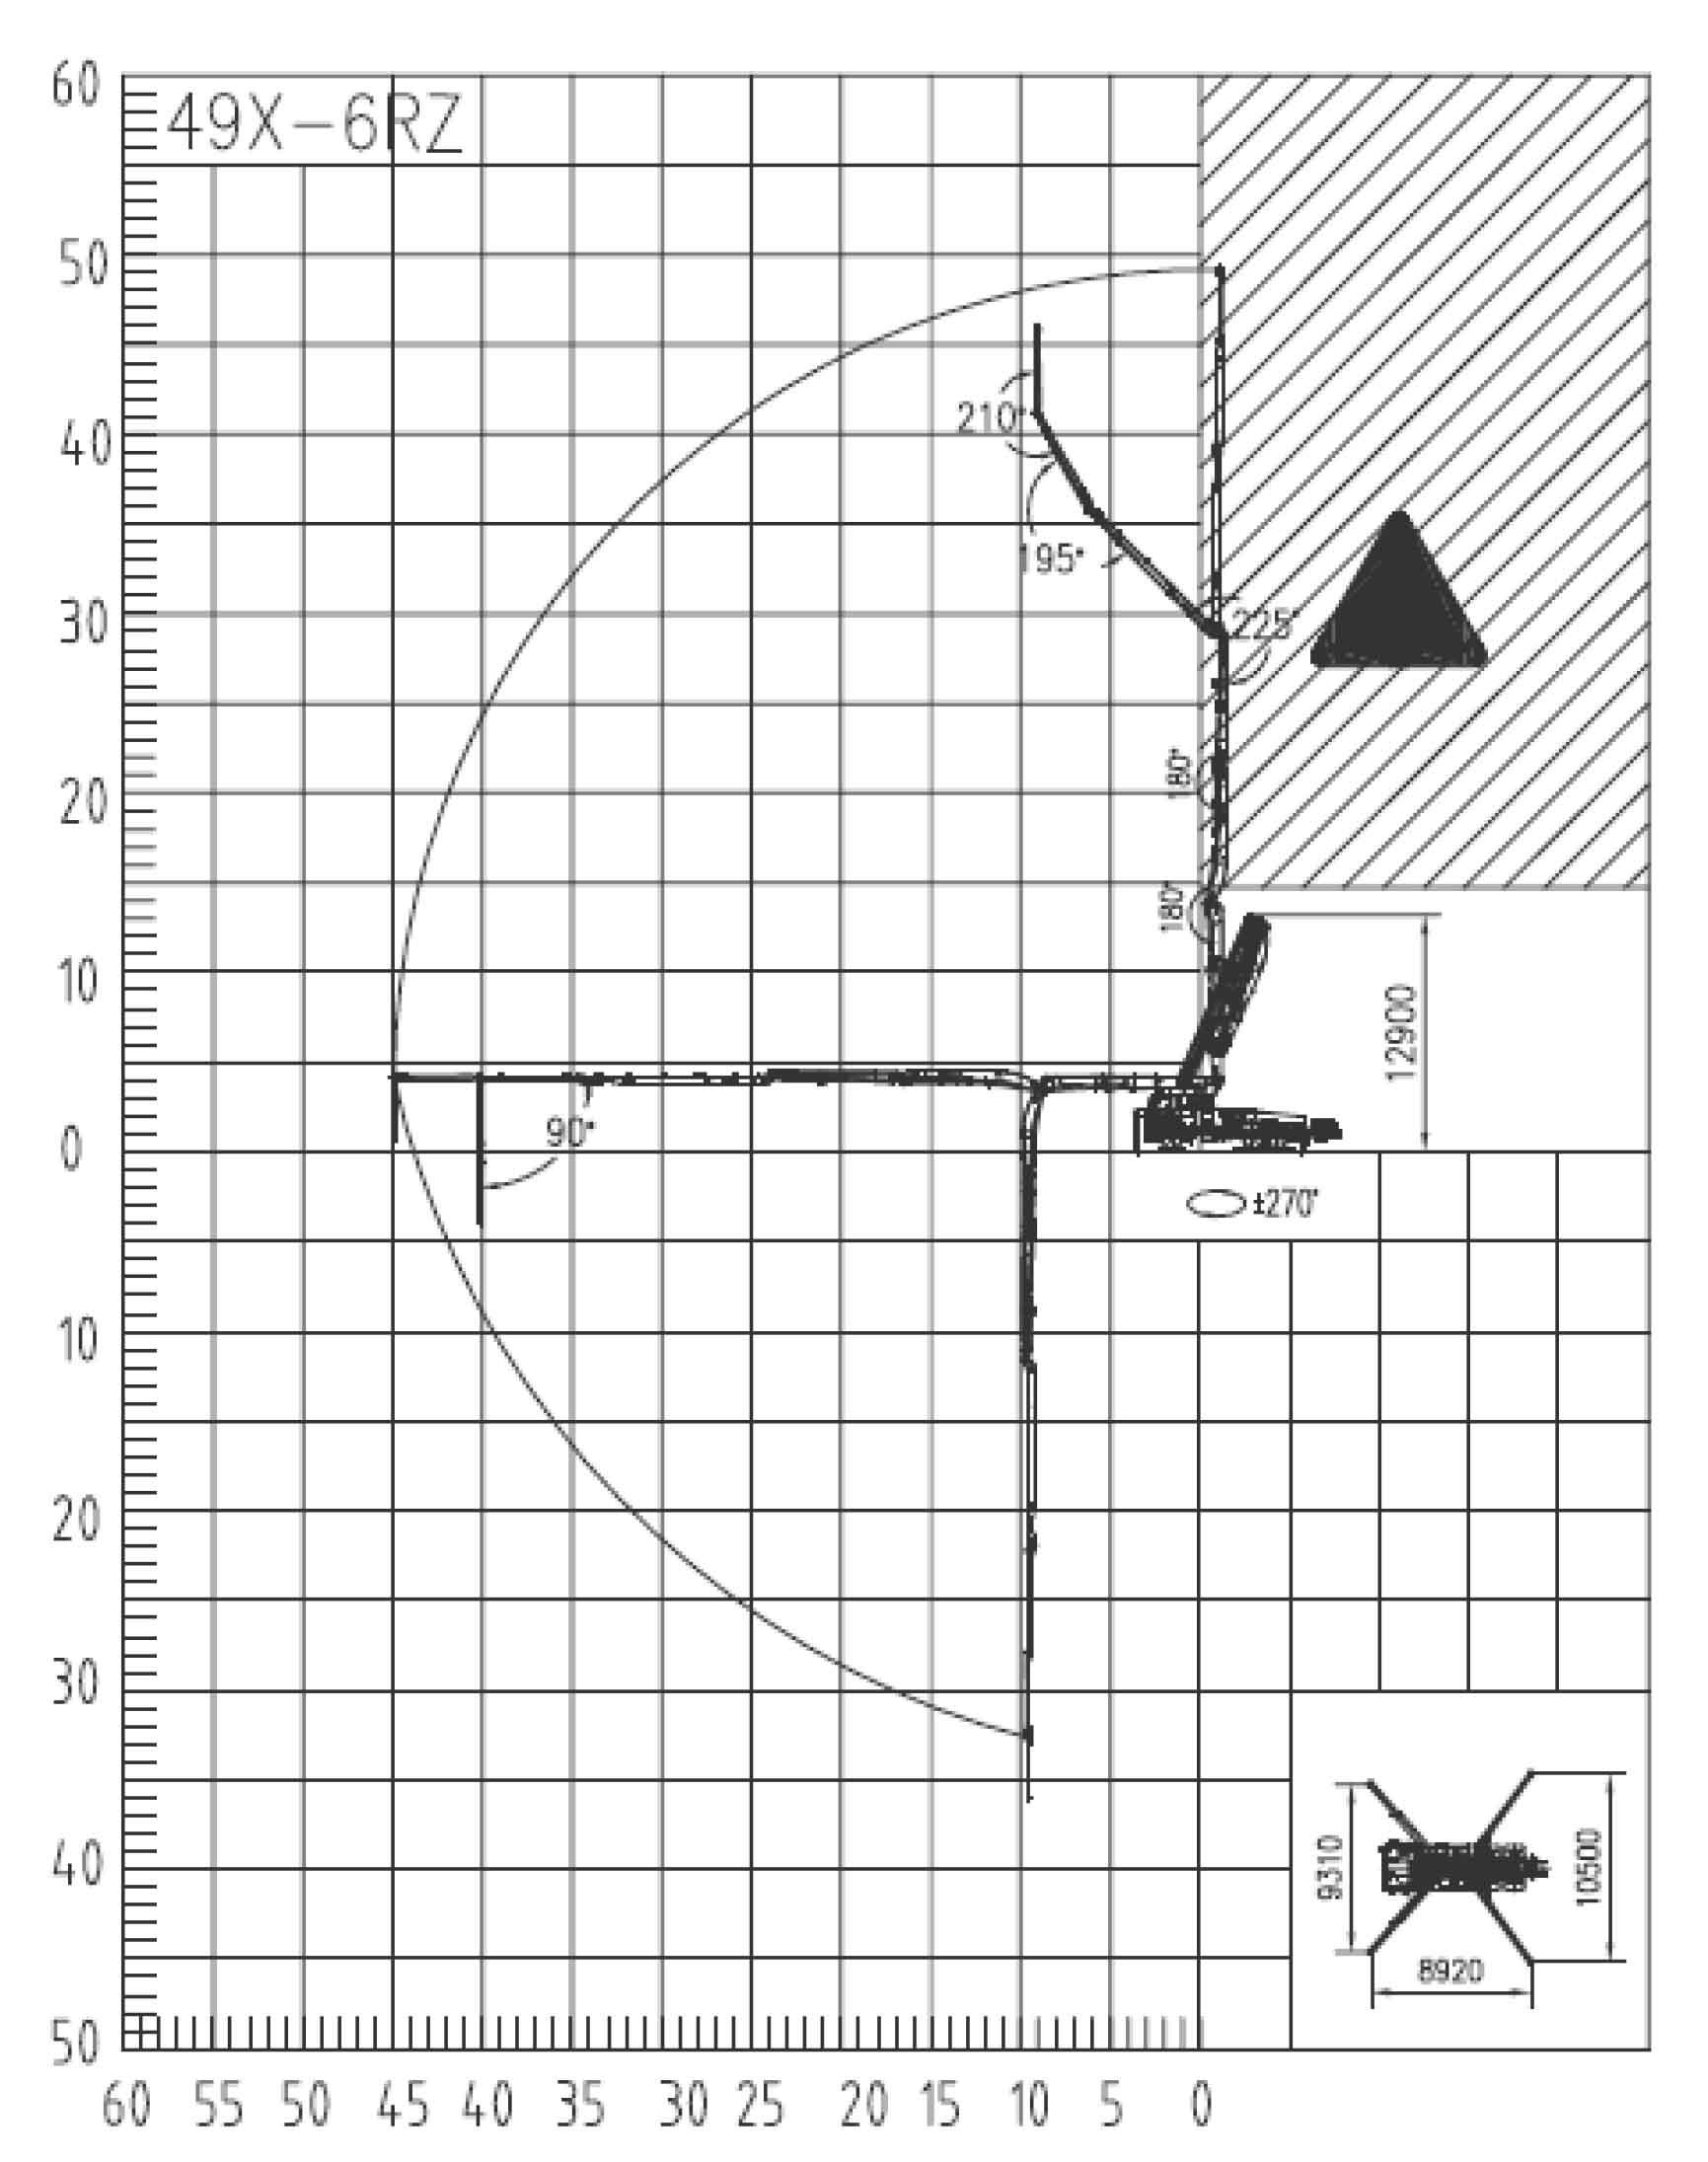 Рабочий диапазон автобетононасоса 49X-6RZ Zoomlion